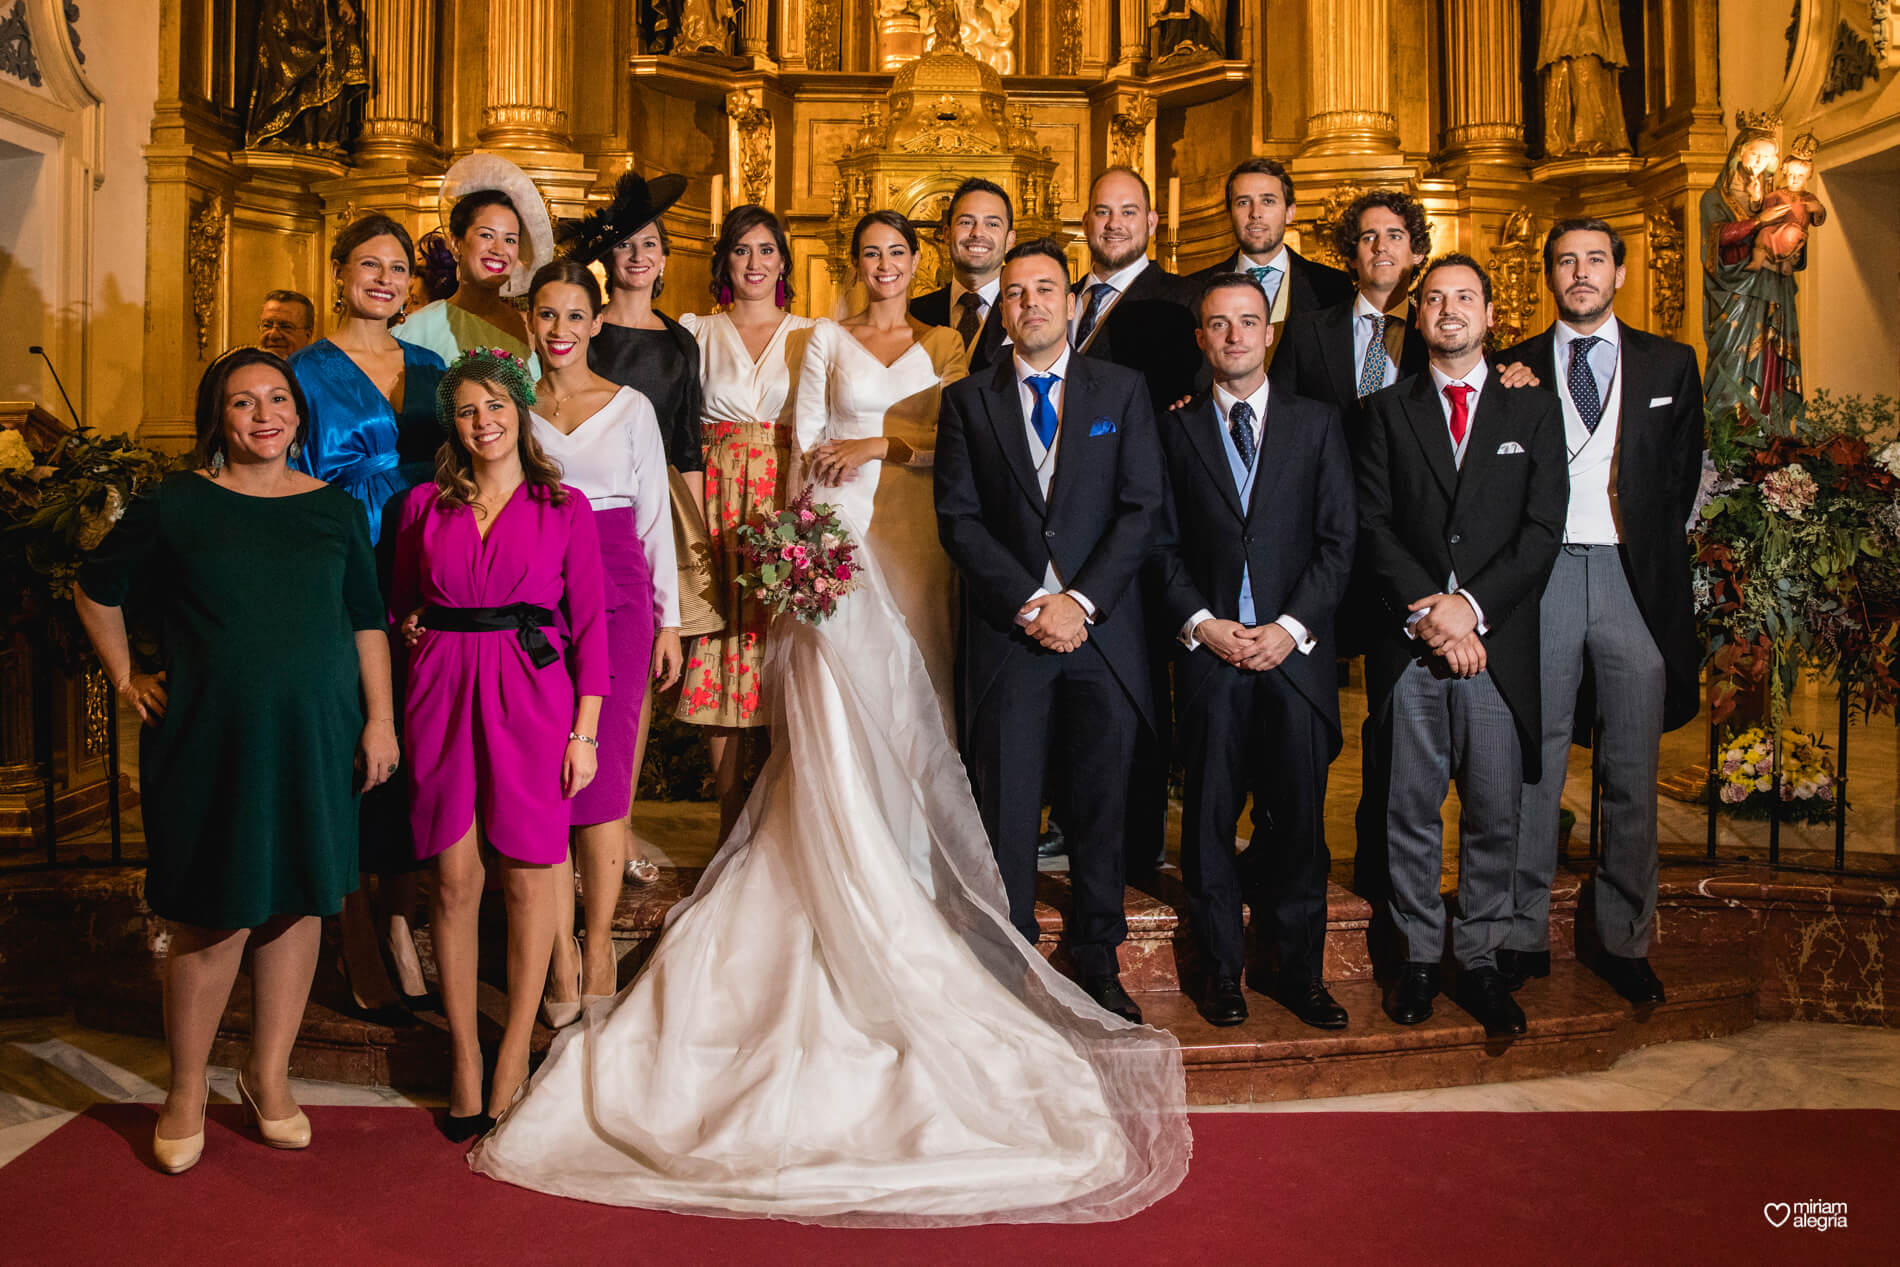 vestido-de-novia-paula-del-vas-miriam-alegria-fotografos-boda-murcia-75